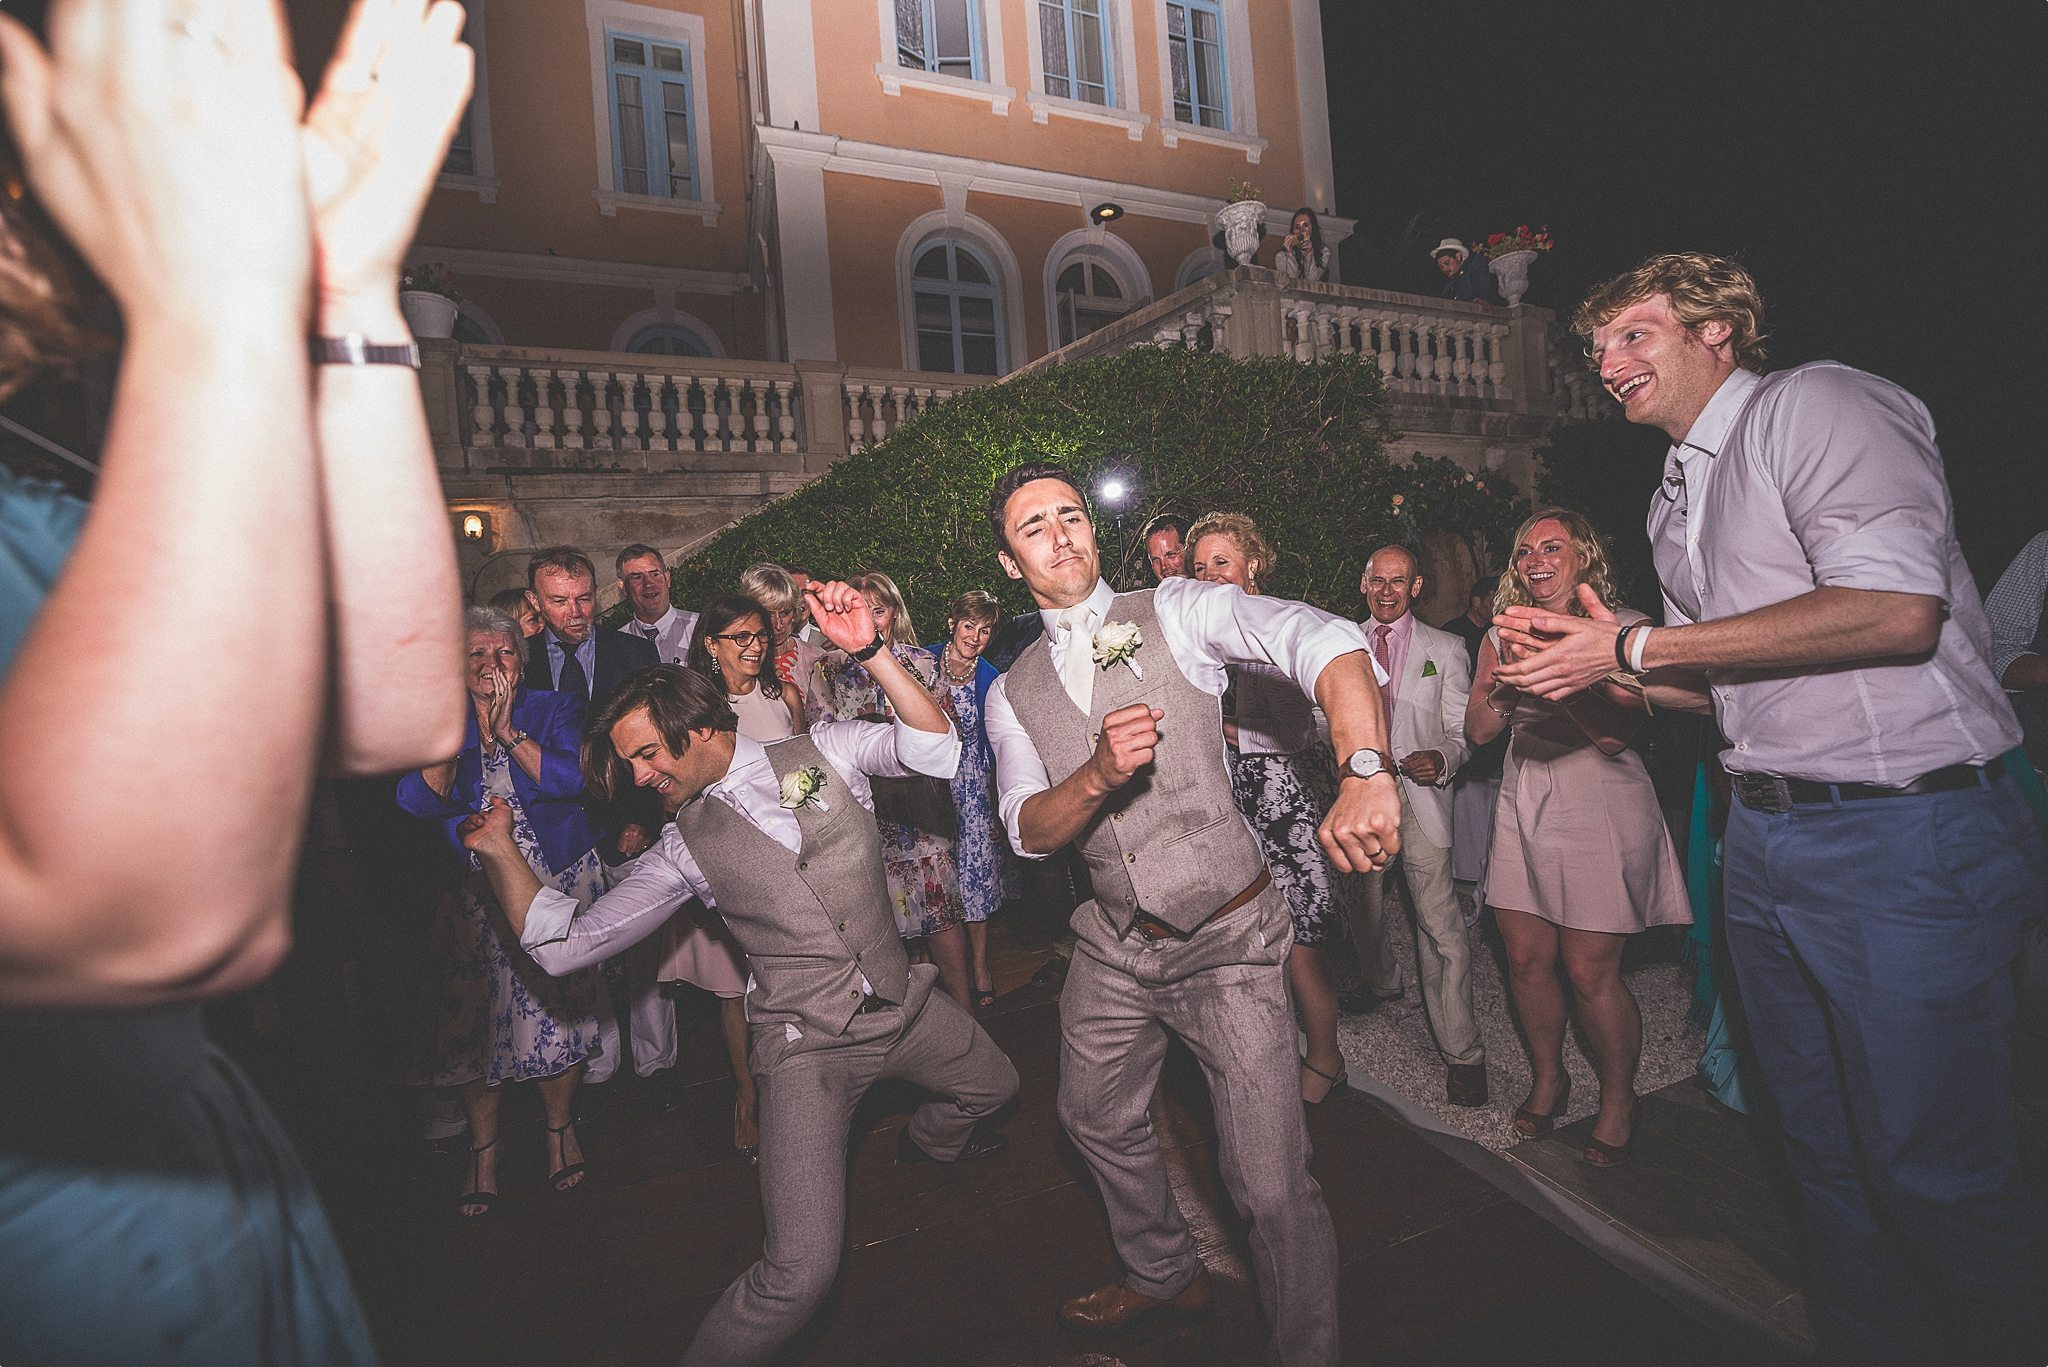 Domaine de la Croix Hotel L'Orangerie South of France vineyard and beach Wedding - Maria Assia Photography-610